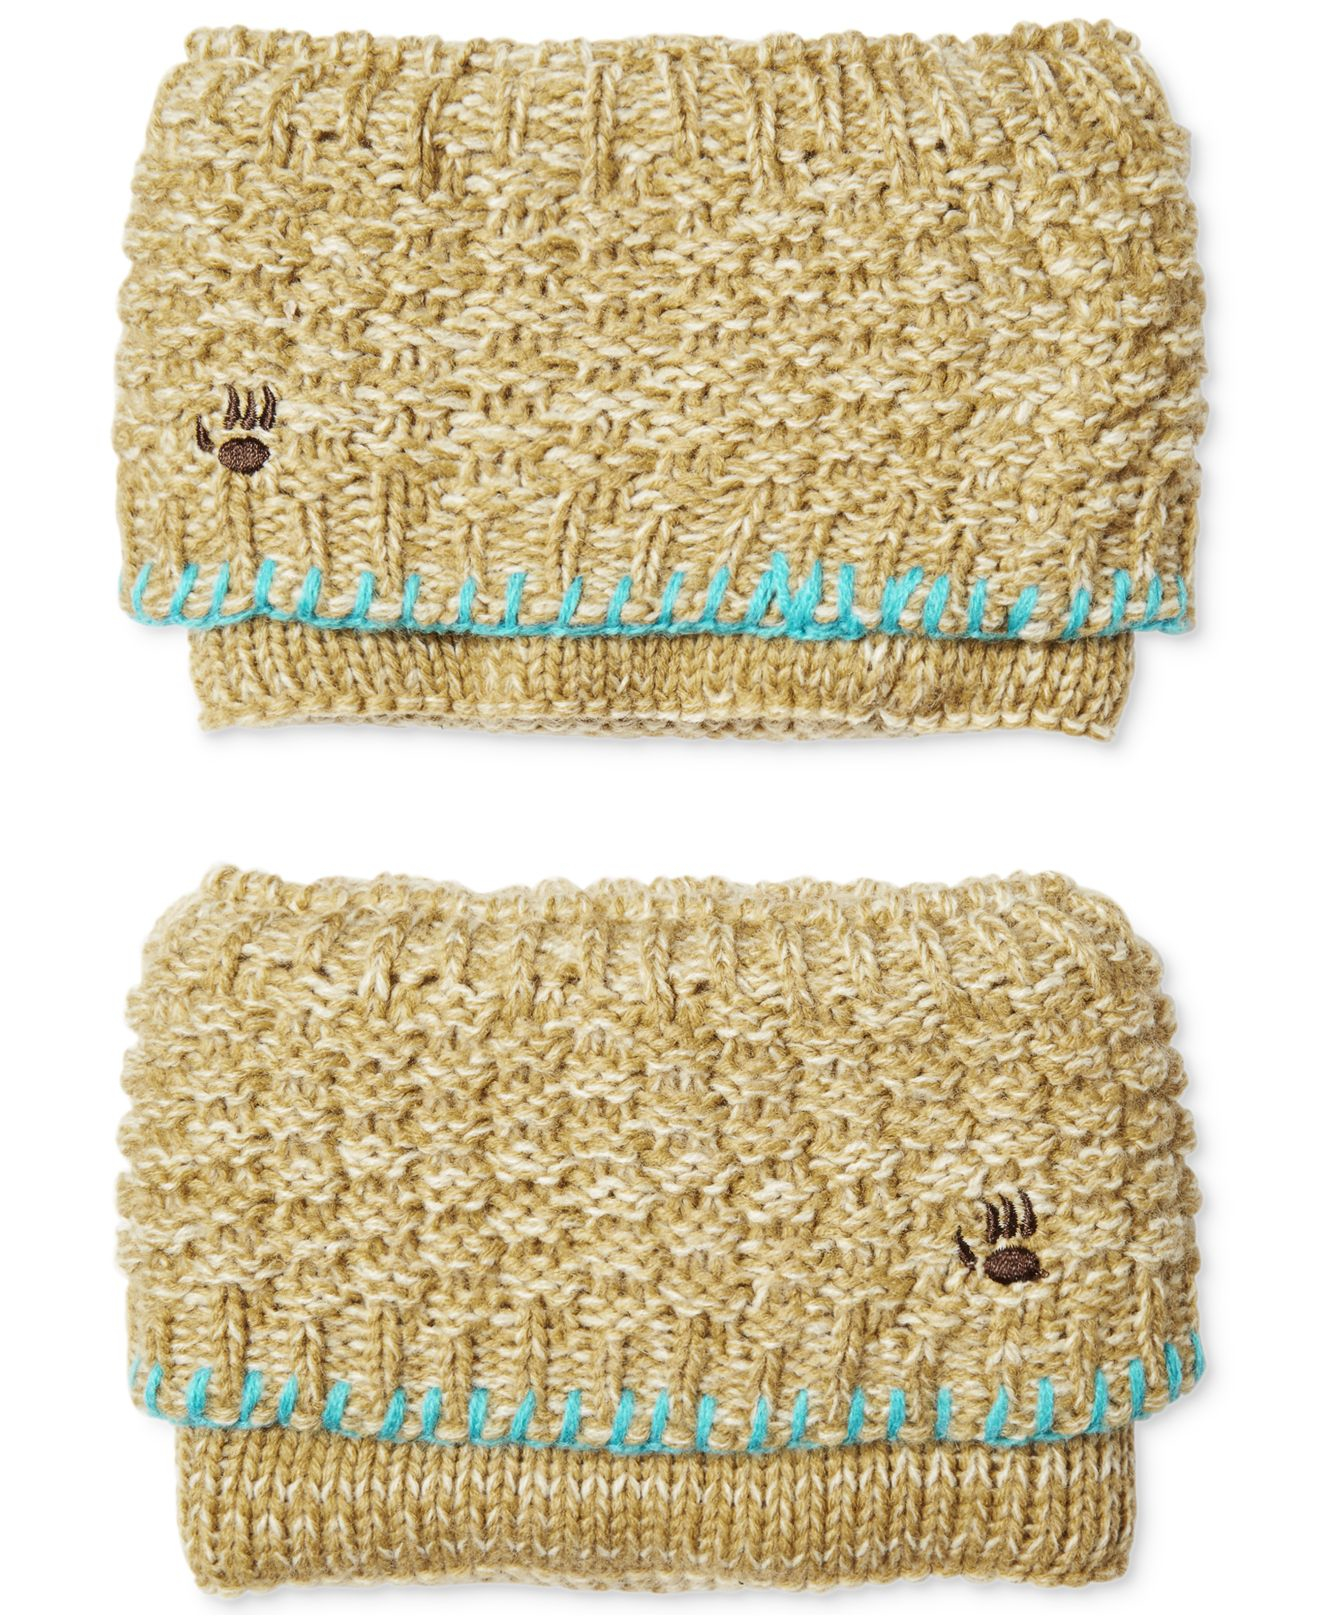 Bearpaw Sweater Knit Boot Cuffs In Brown